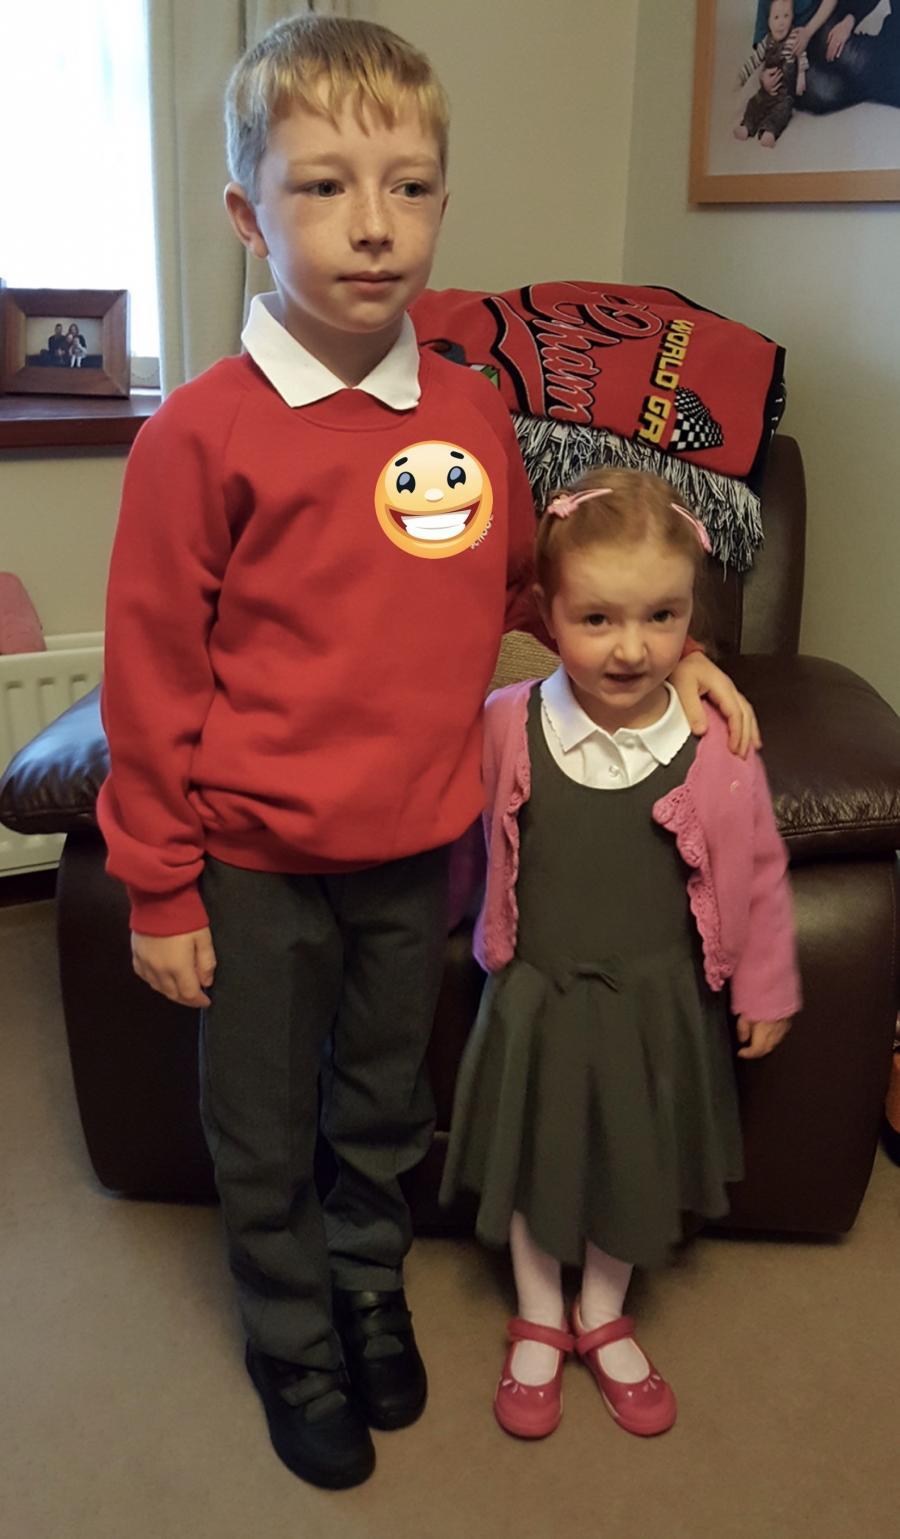 #LivingArrows - Back To School Special